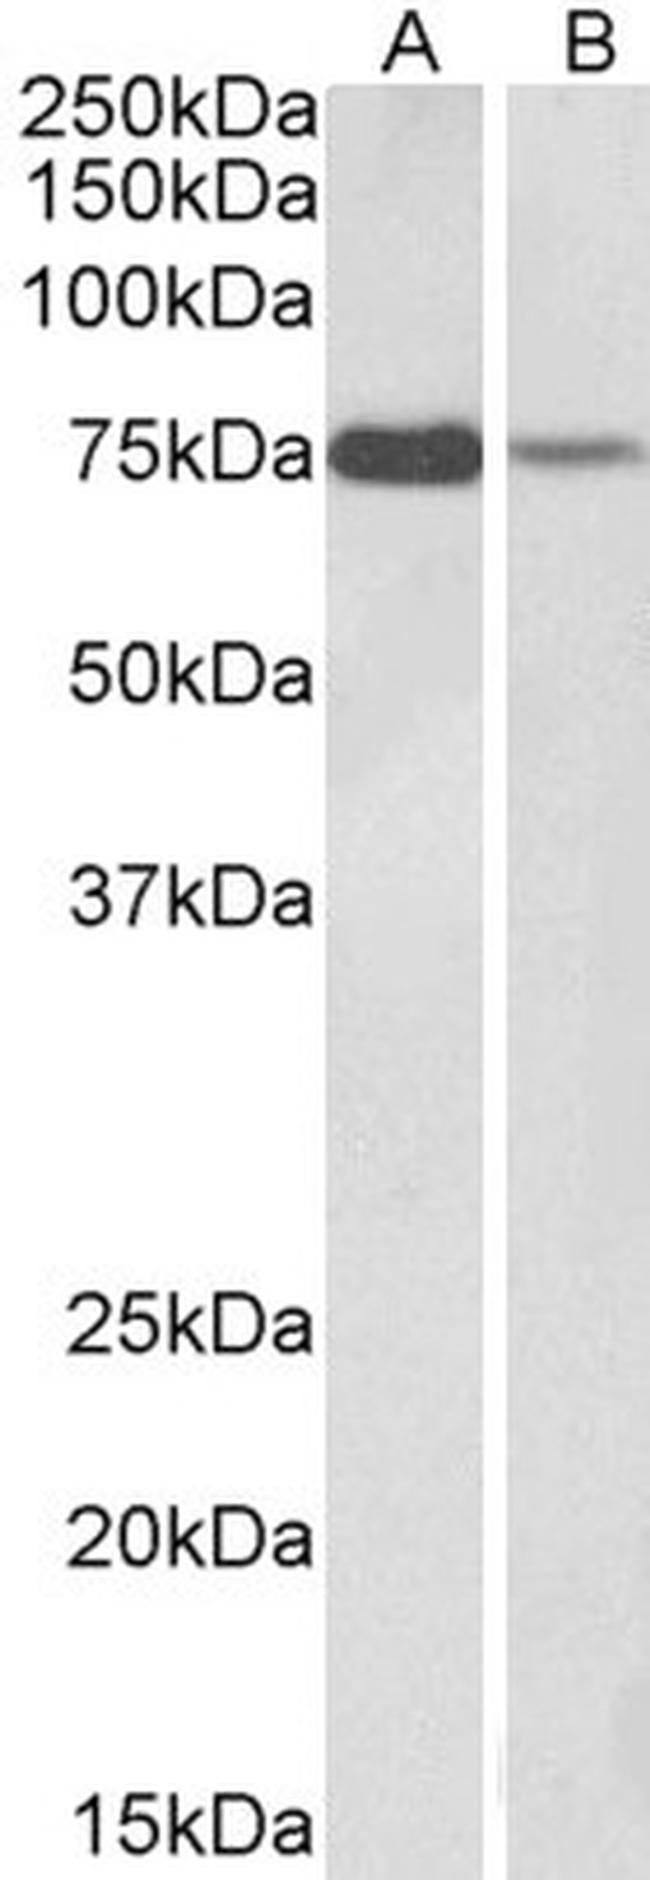 RACGAP1 Antibody (PA5-18005) in Western Blot